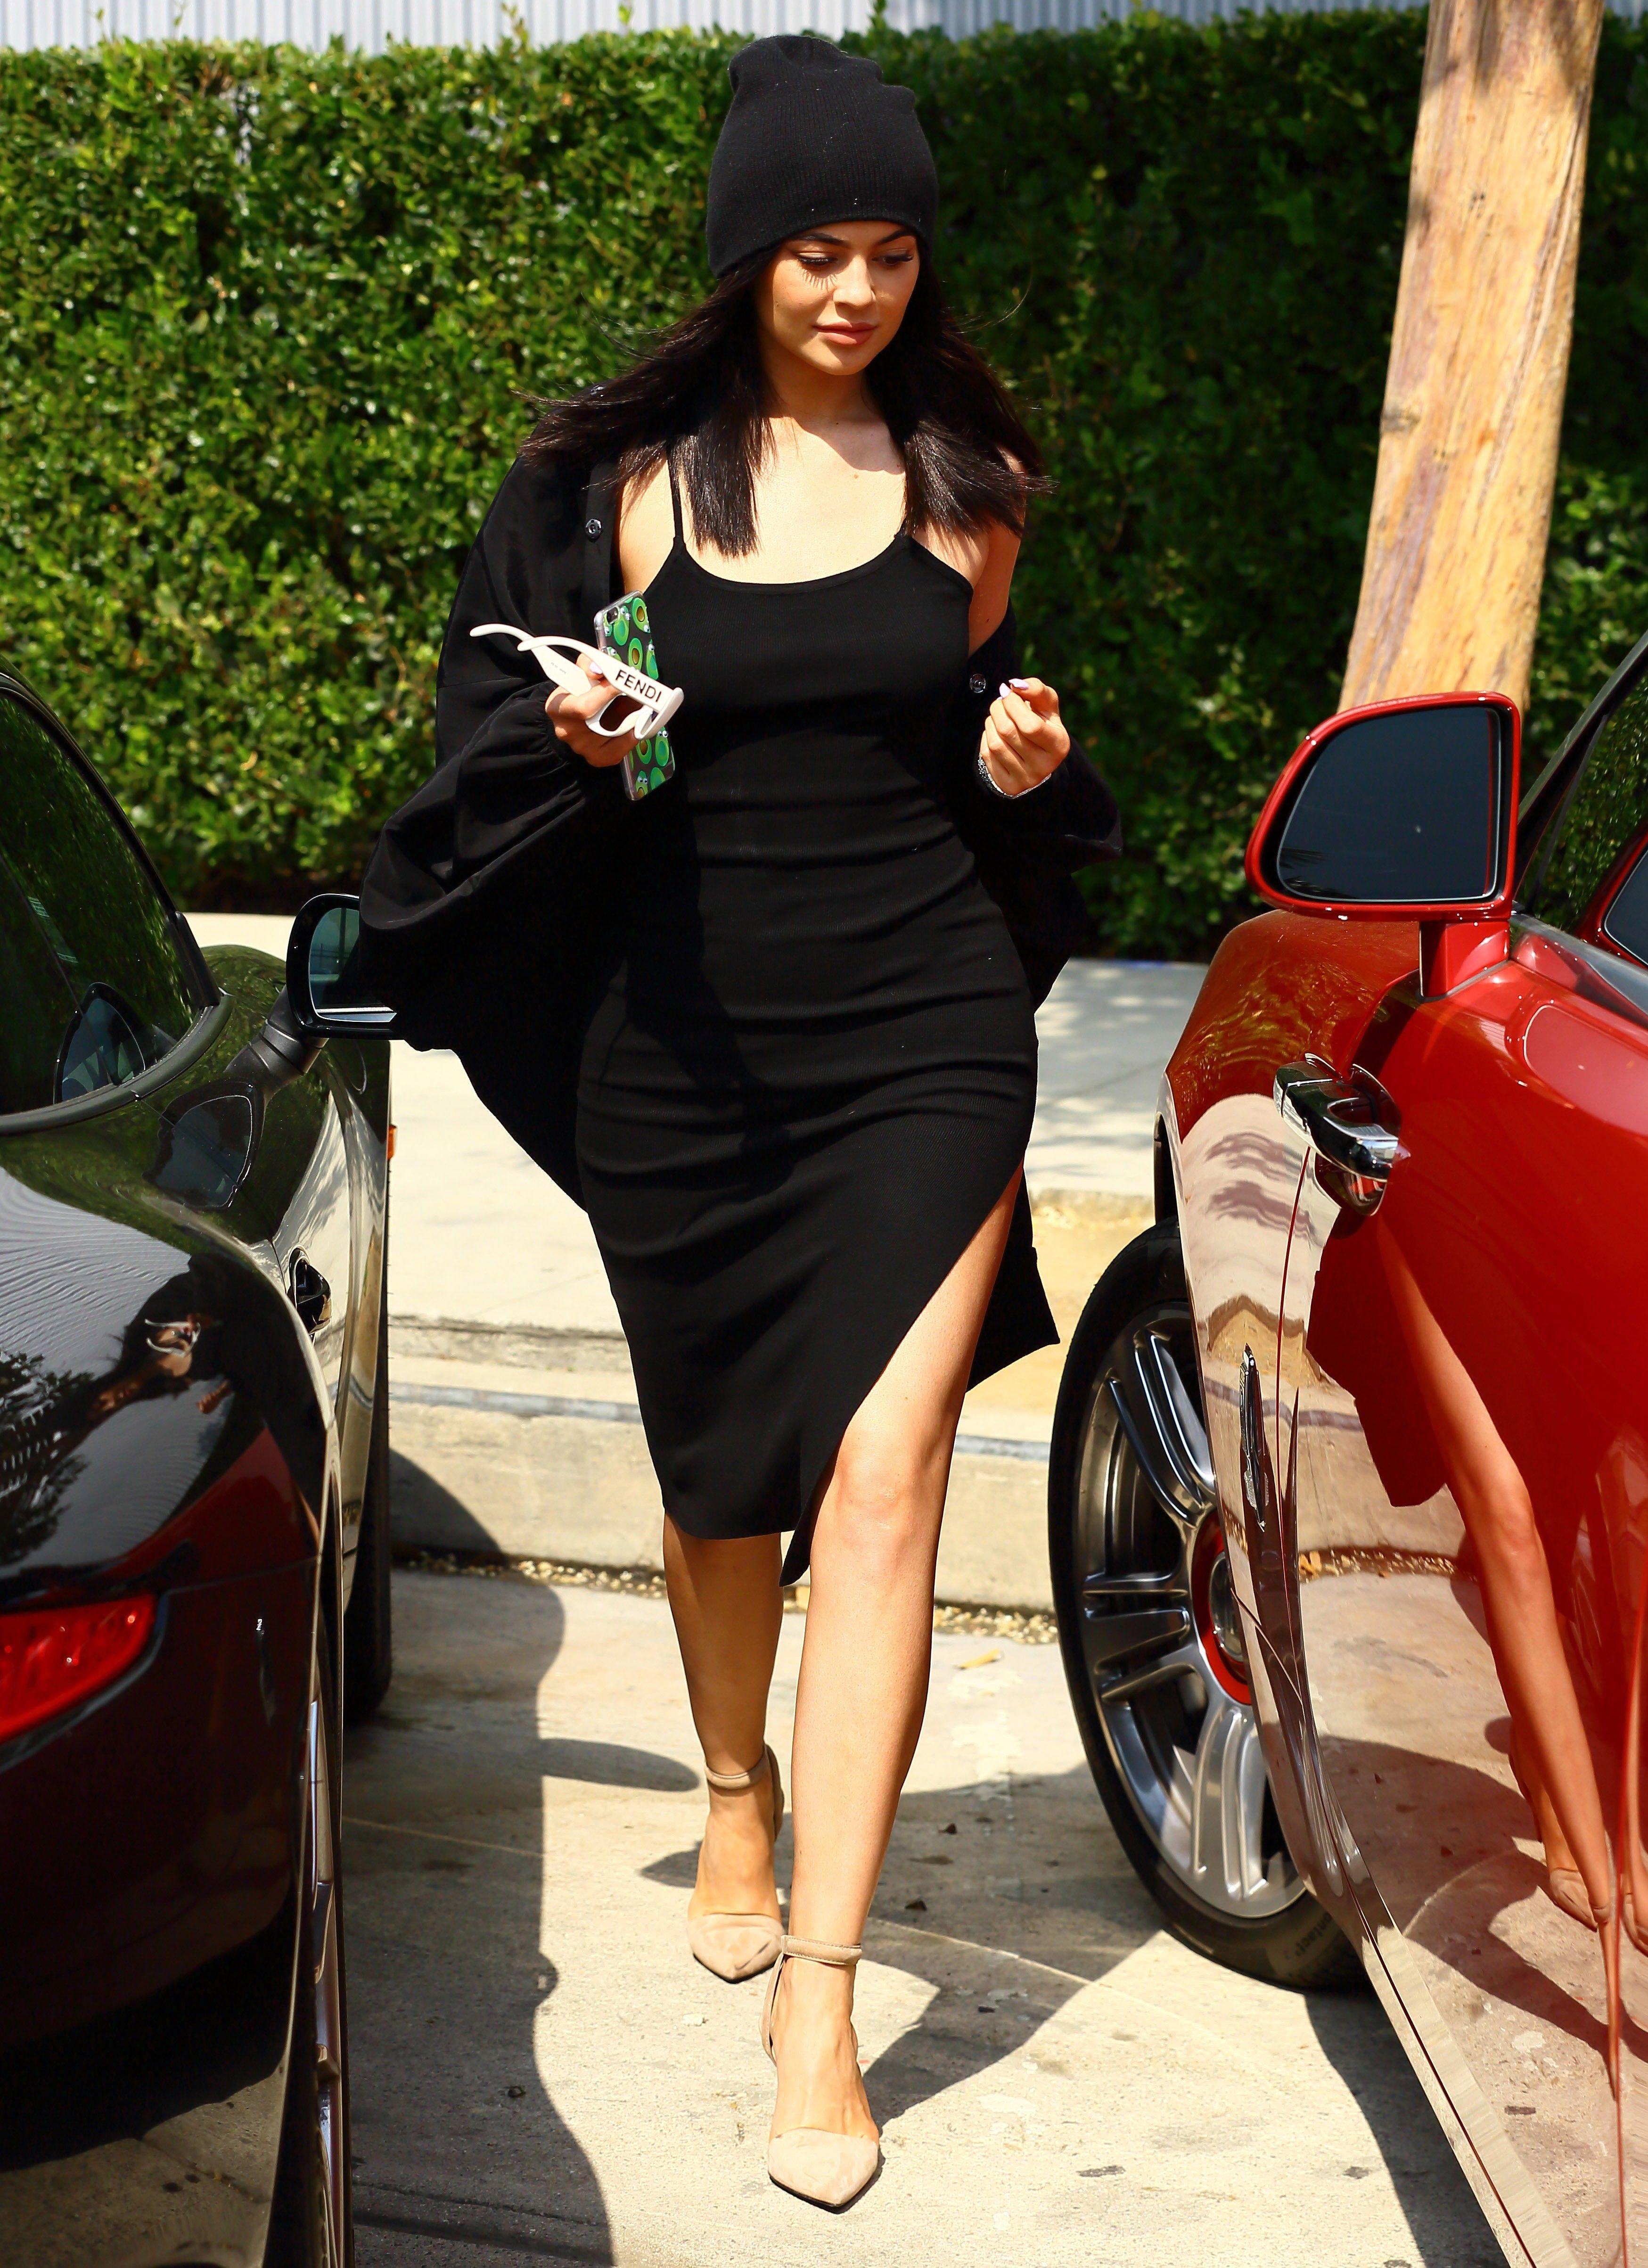 dress - Kylie decoding jenners style video